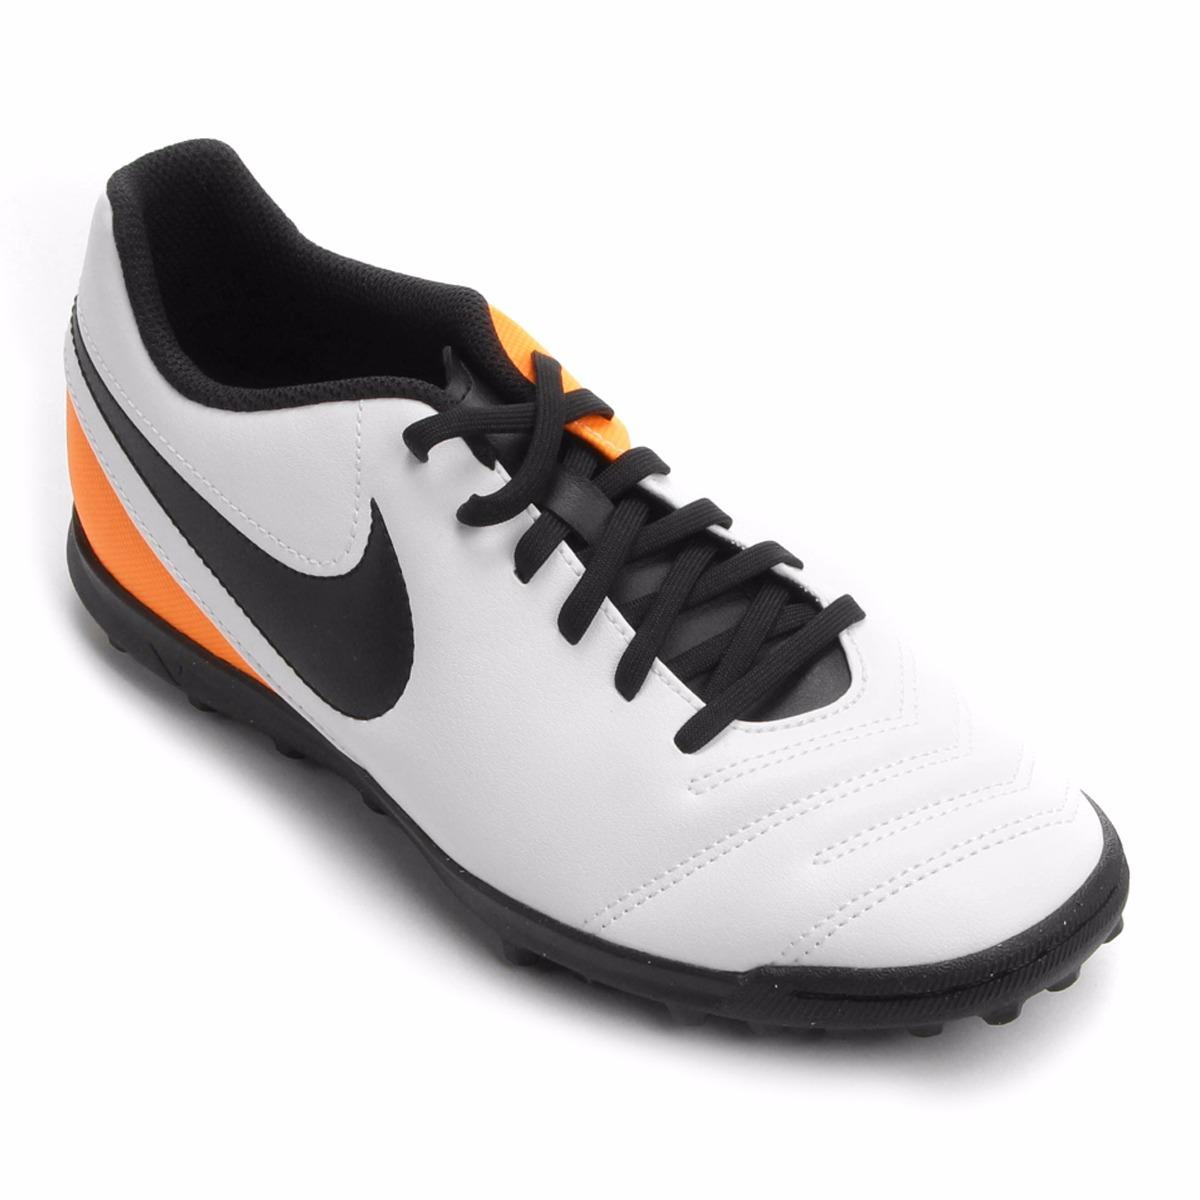 d0b35e4ca6 Chuteira Nike Tiempo Rio 3 Tf Masculino Society - 18532 - R  233